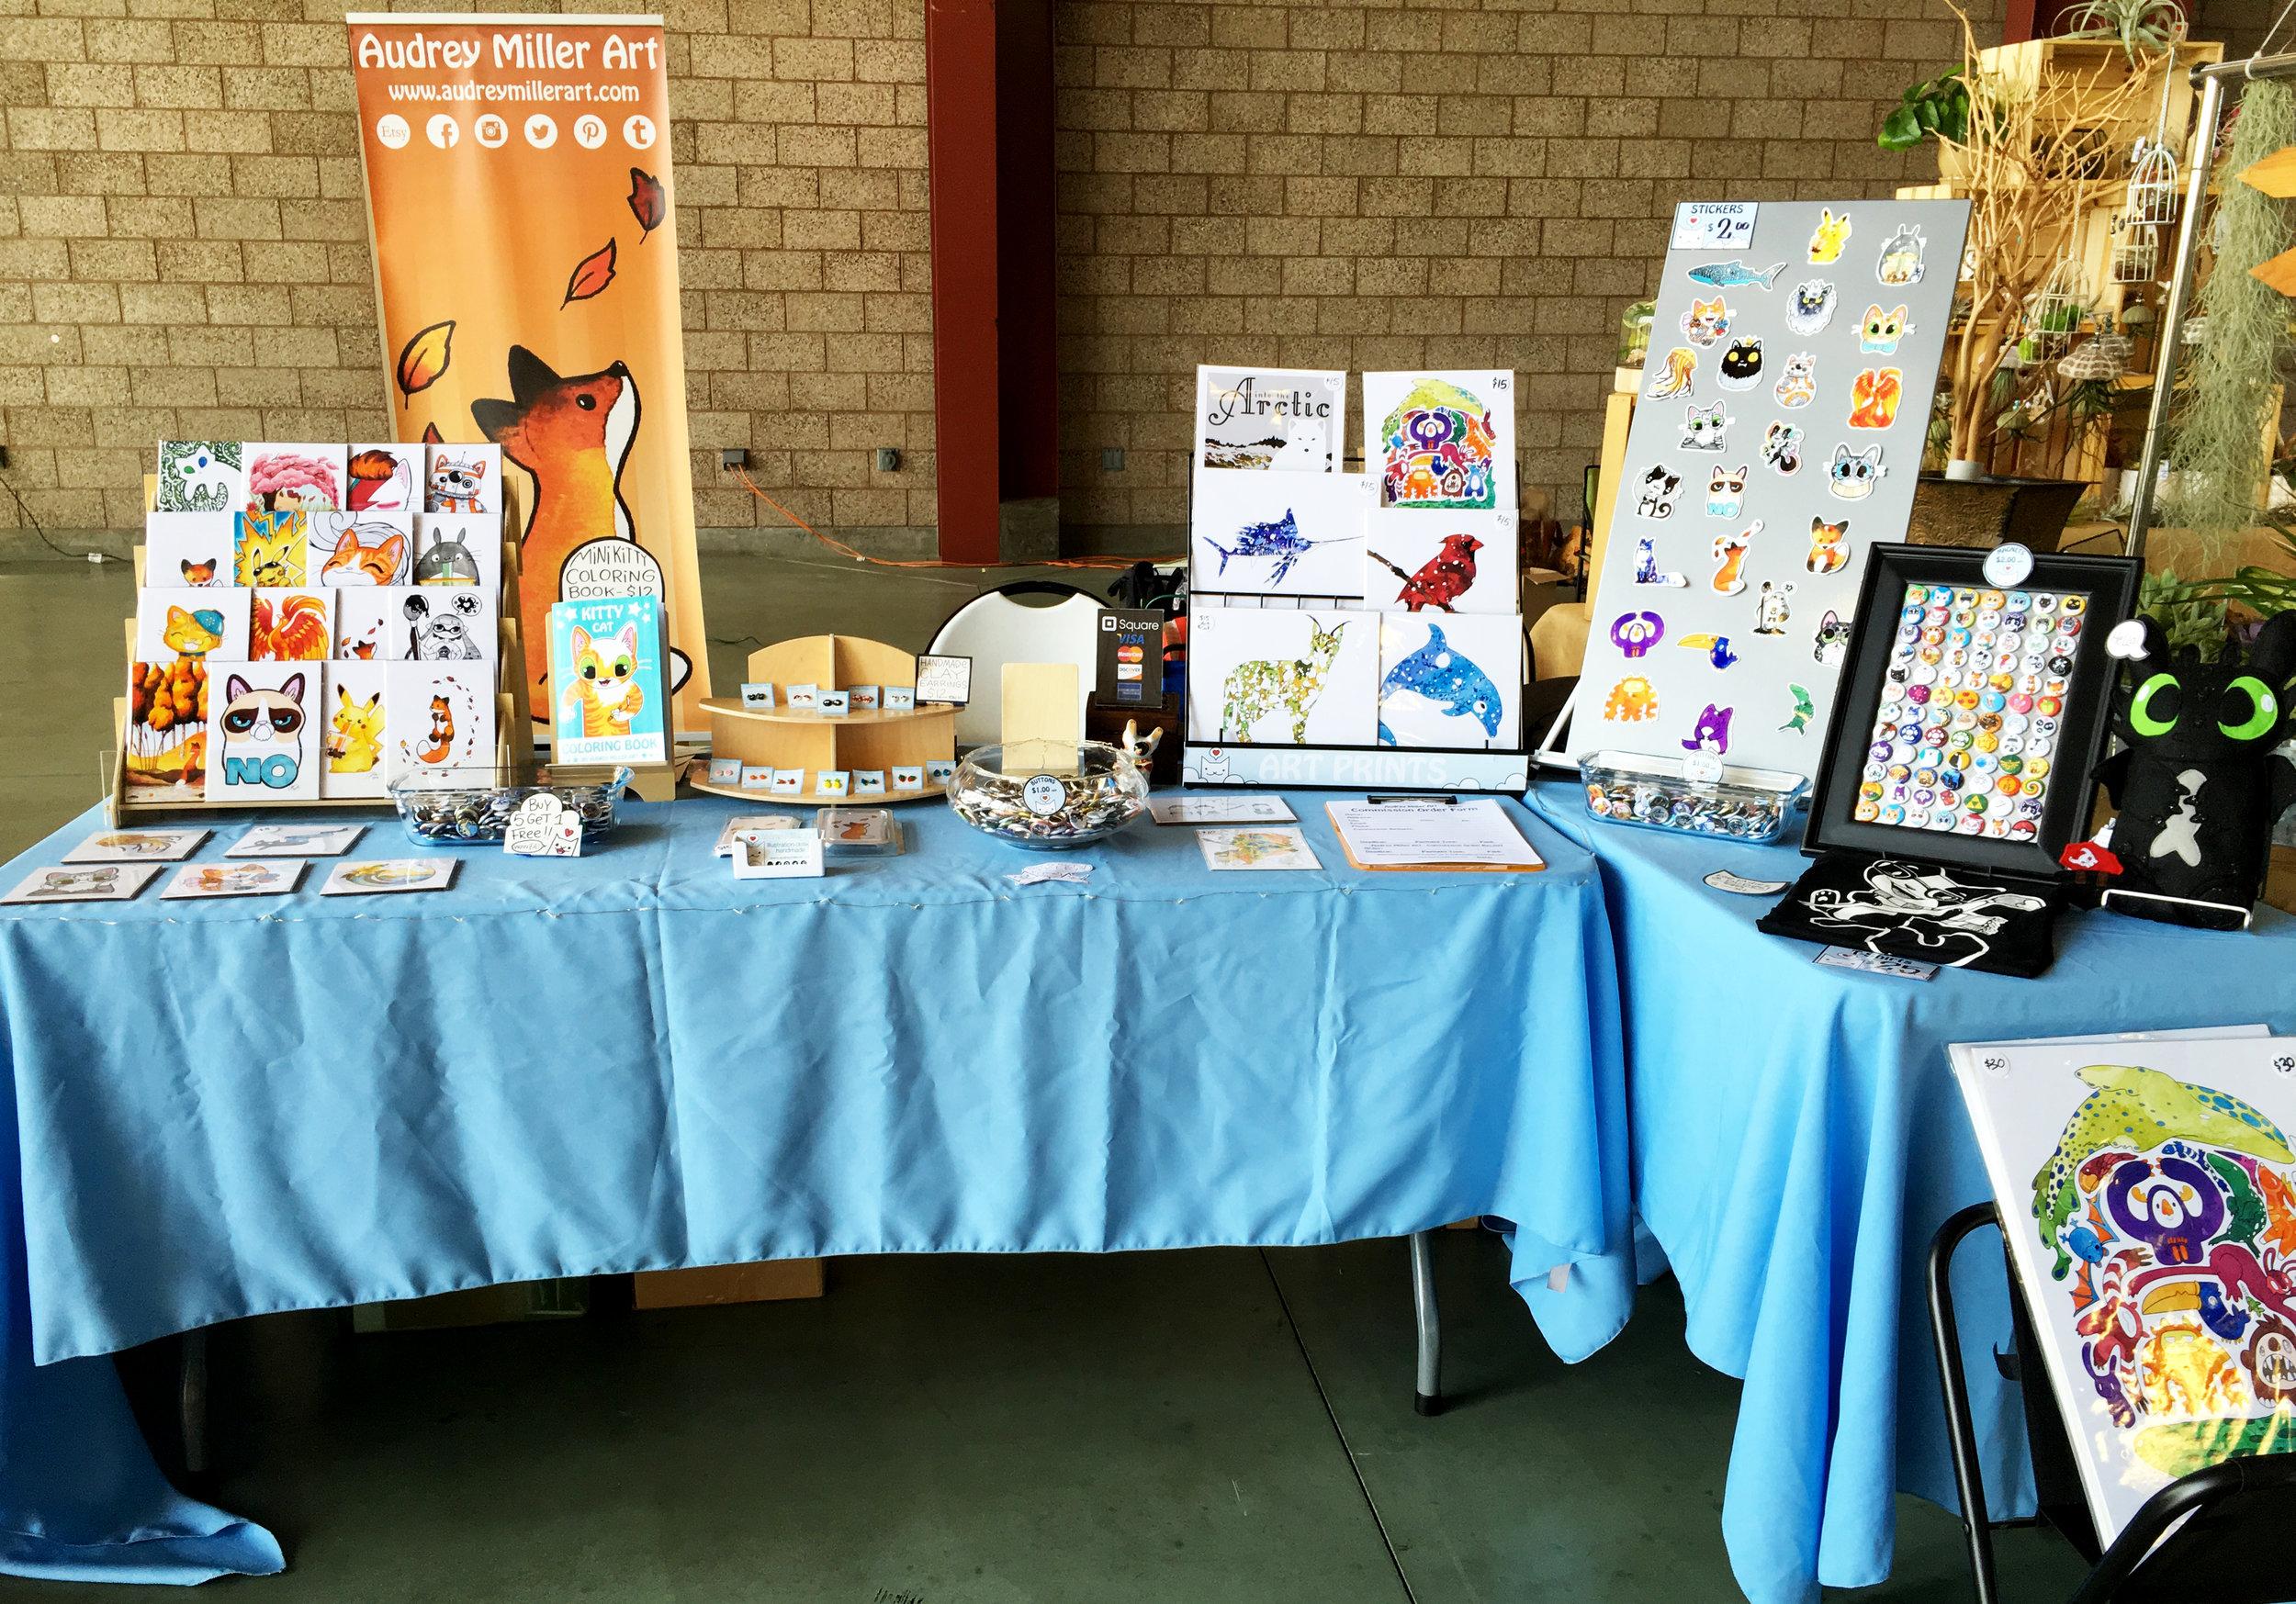 OC Night Market 2016 - OC Fairground - Costa Mesa, CA